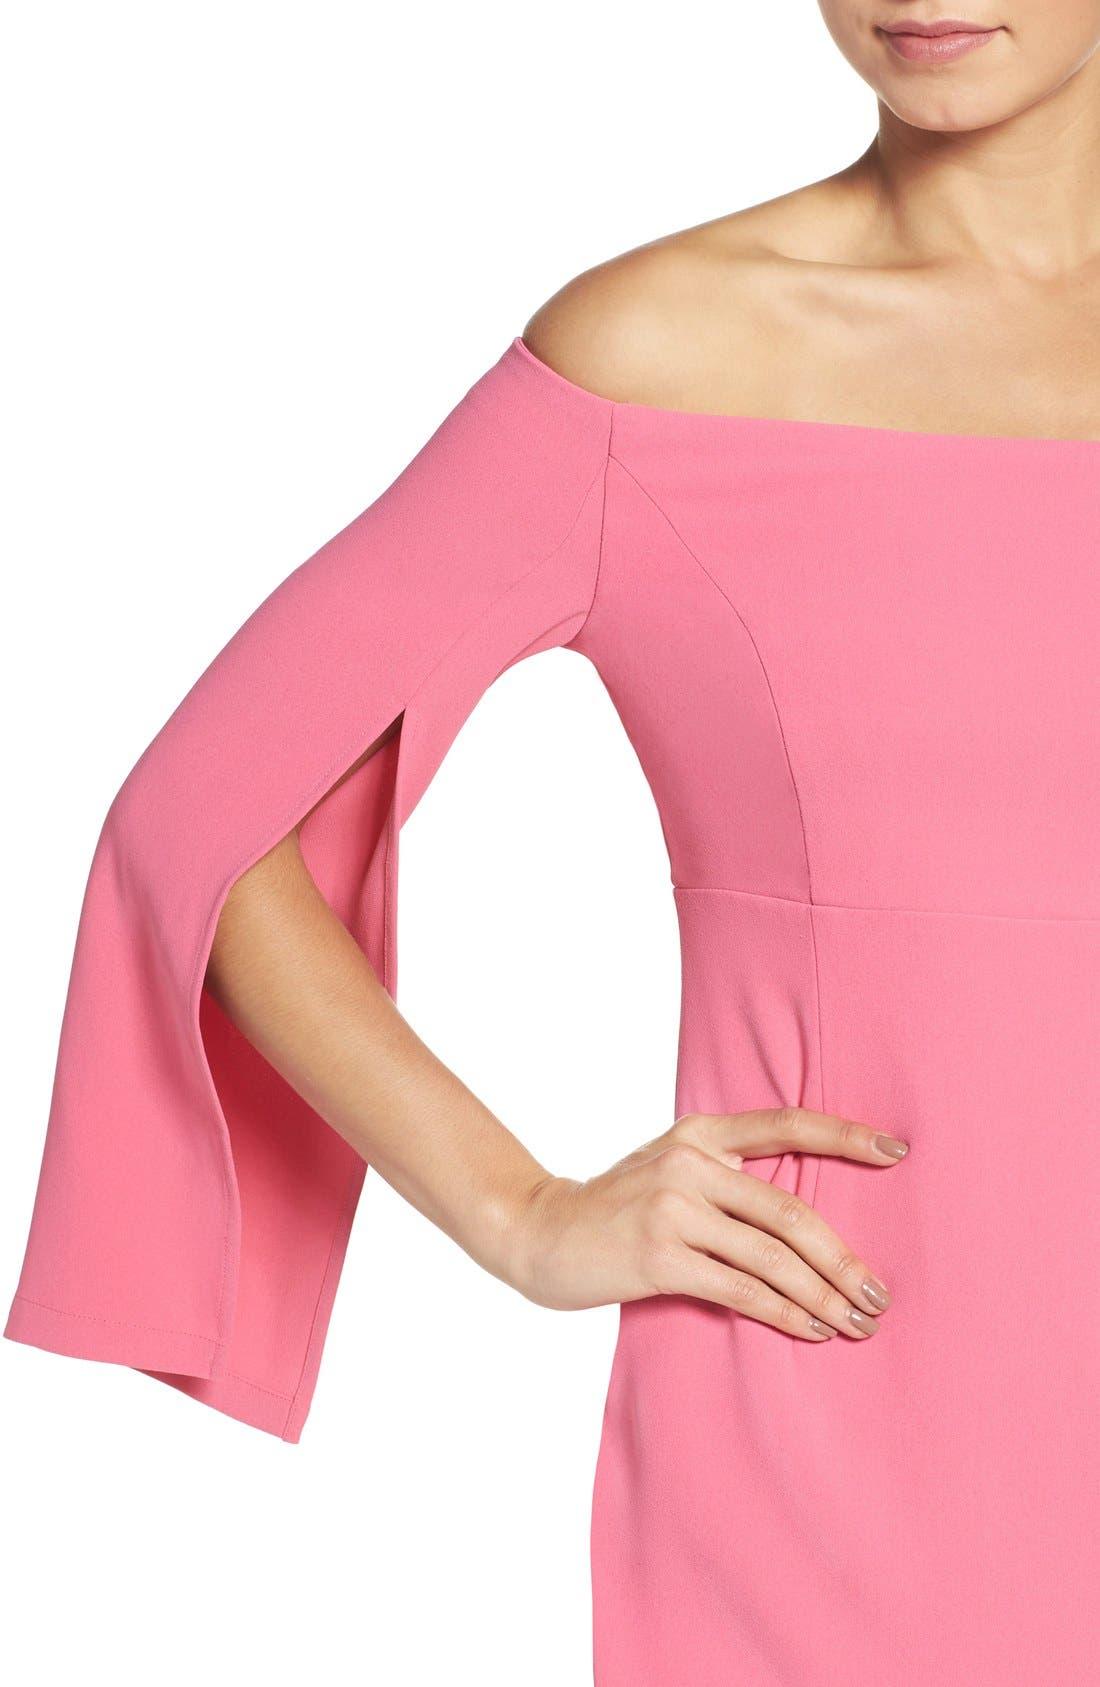 Ava Off the Shoulder Dress,                             Alternate thumbnail 5, color,                             Tulip Pink